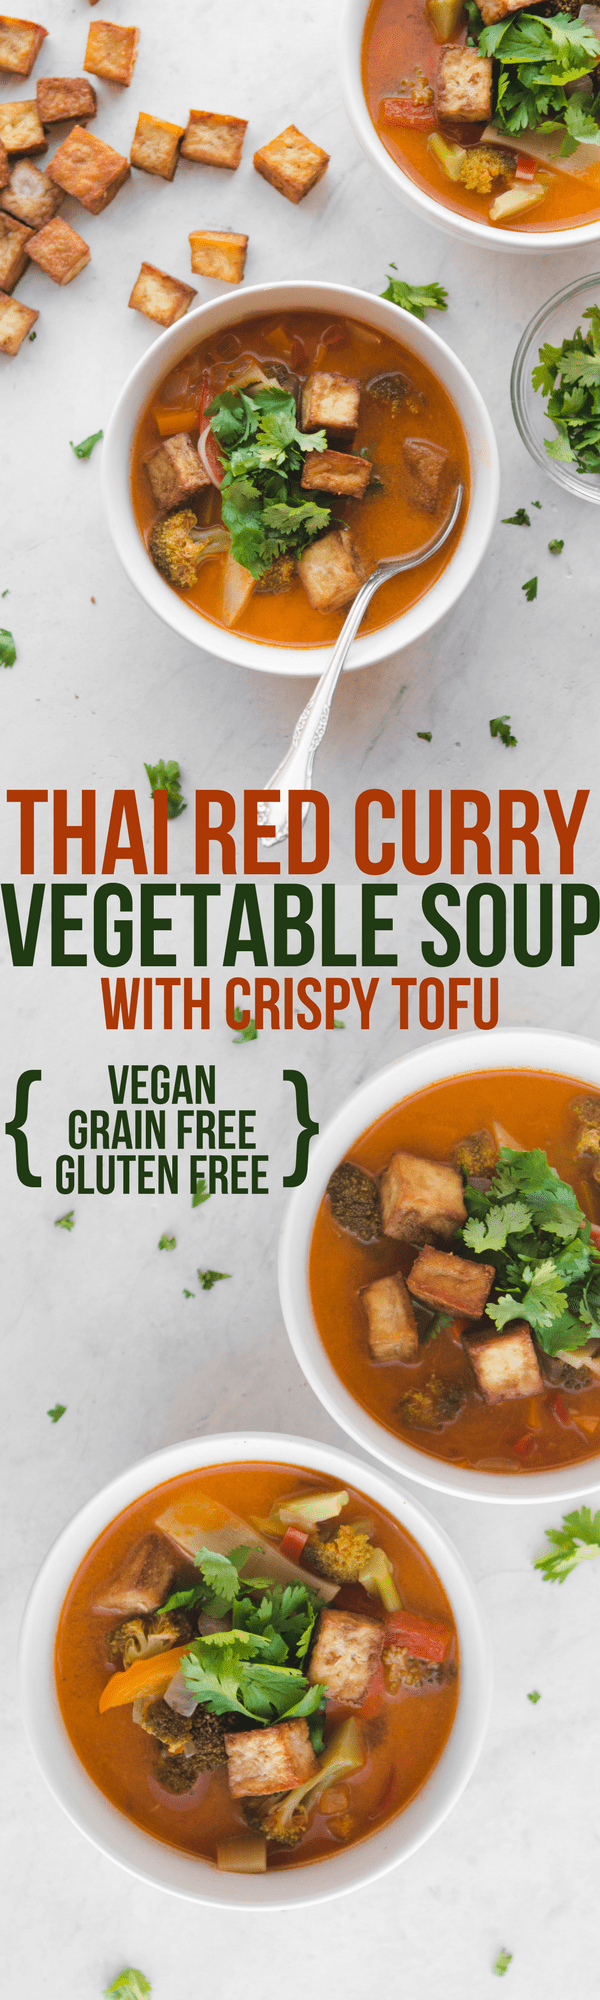 Thai Red Curry Vegetable Soup #soup #vegan #plantbased #easydinner